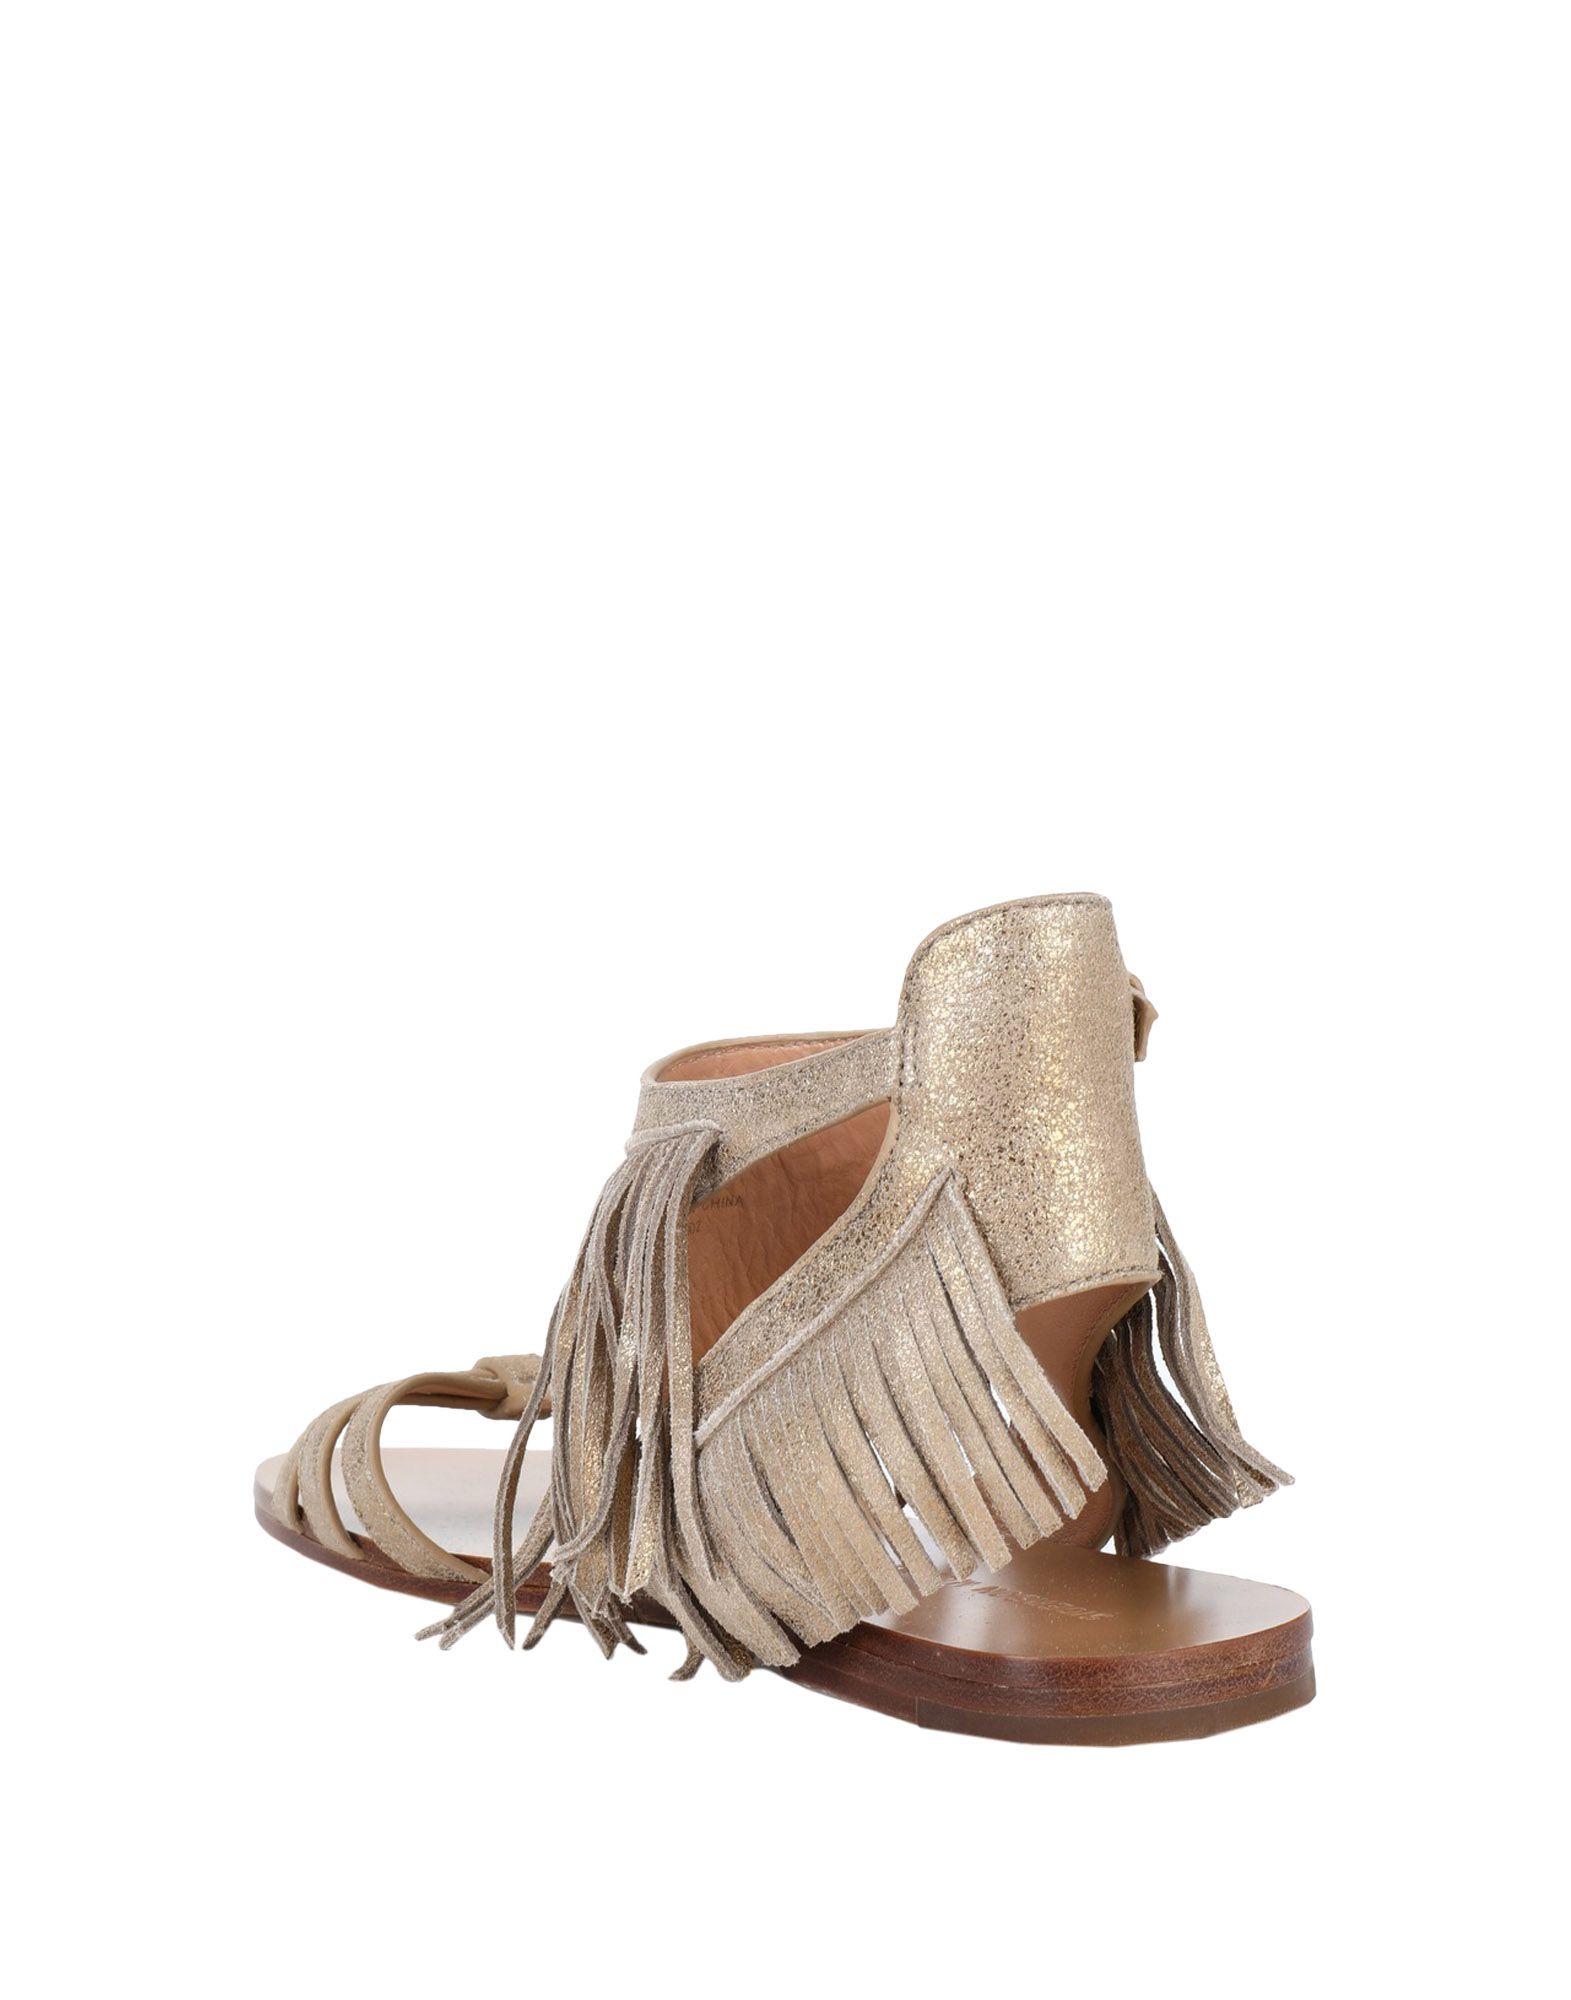 c'morrison sandales - femmes c'morrison sandales canada en ligne sur canada sandales f342ca